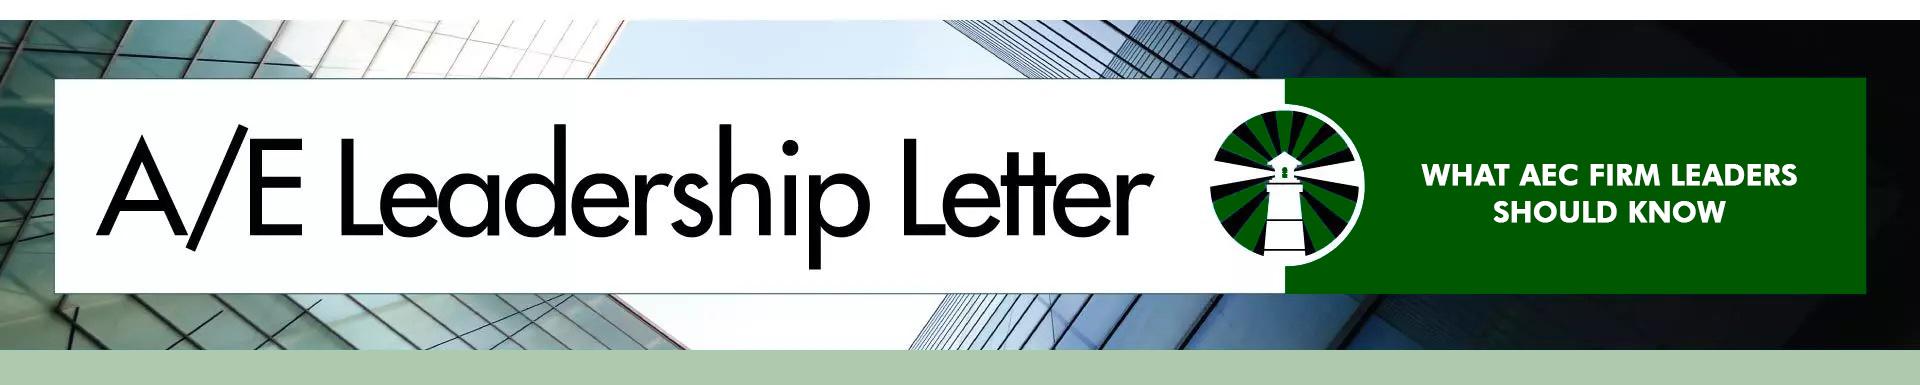 A/E Leadership Letter